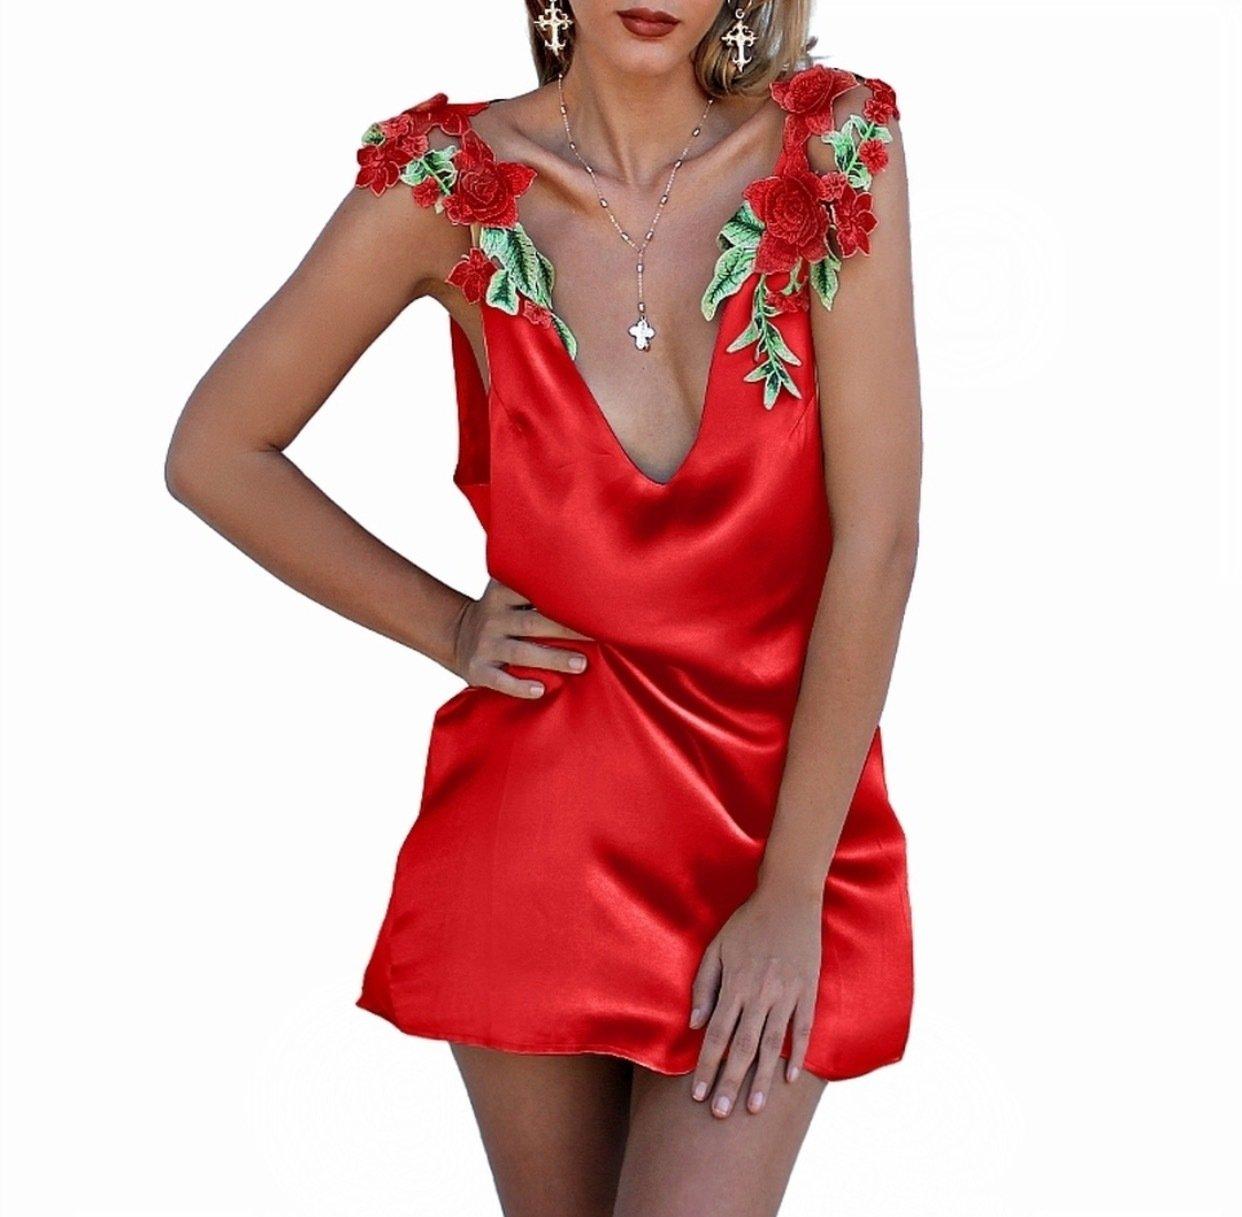 Summer Y V Neck Sleeveless Embroidered Slip Dress Backless Fashion Slim Off The